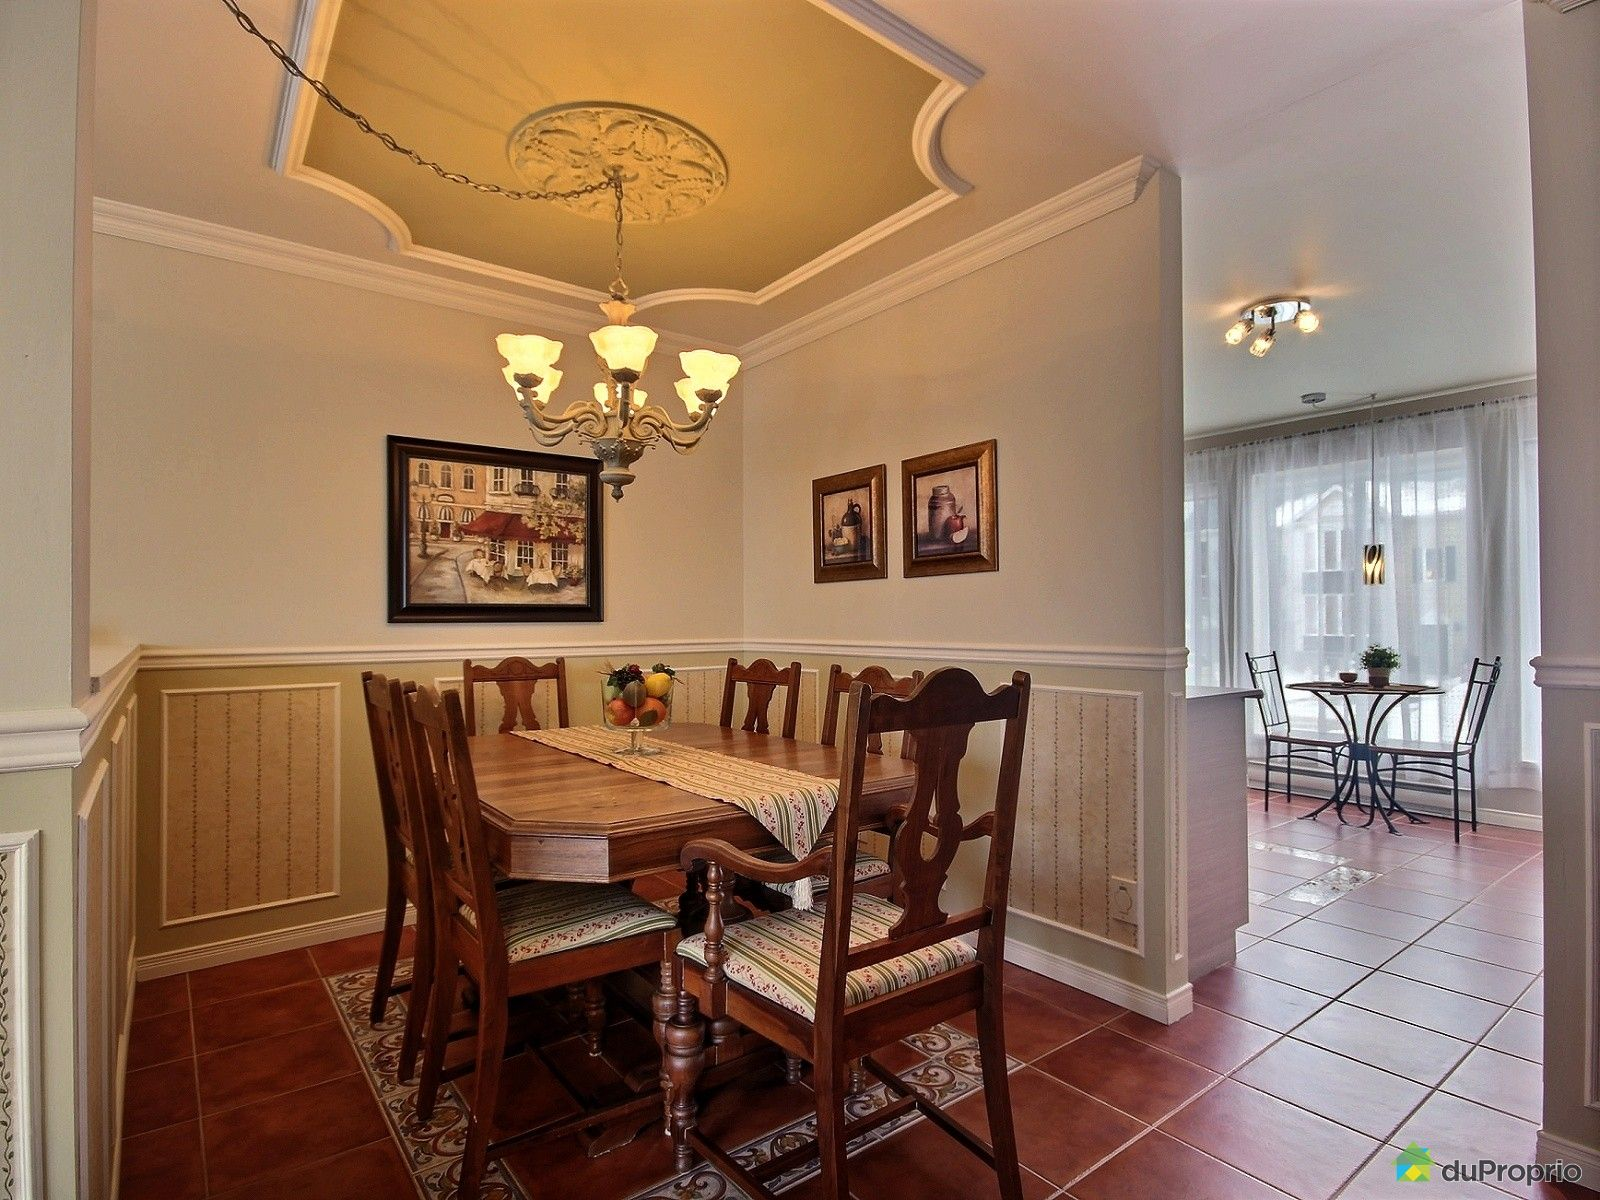 maison vendu duberger immobilier qu bec duproprio 570907. Black Bedroom Furniture Sets. Home Design Ideas